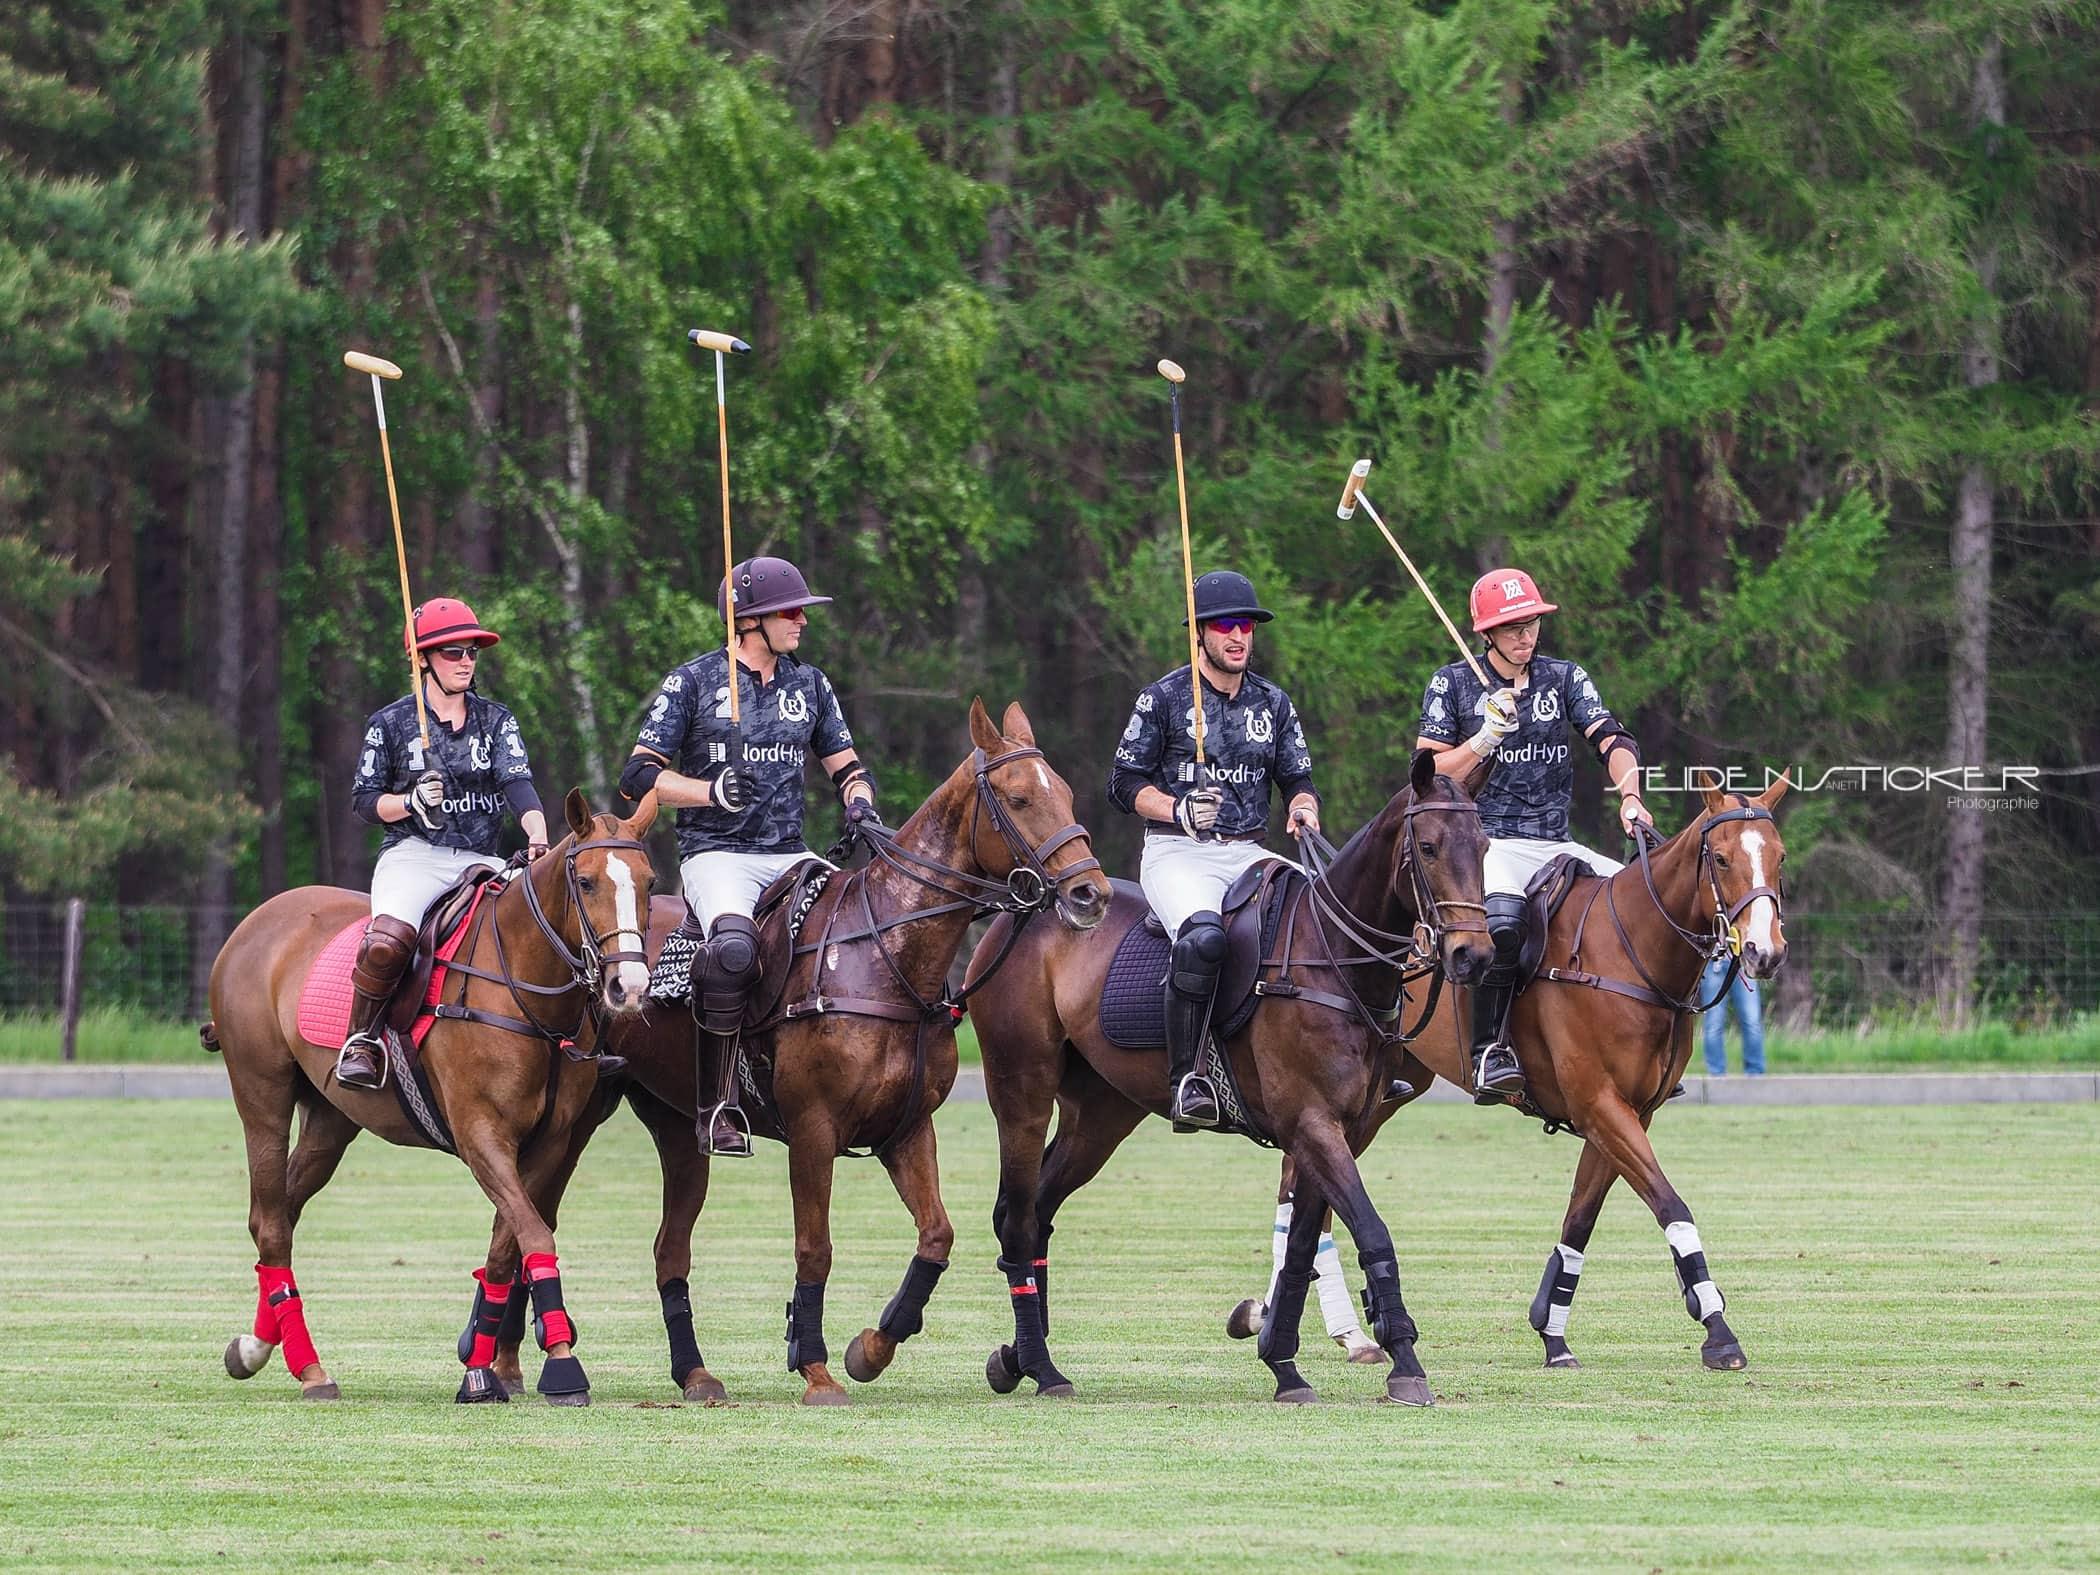 Seidensticker Fotografie - Poloclub Rixförde